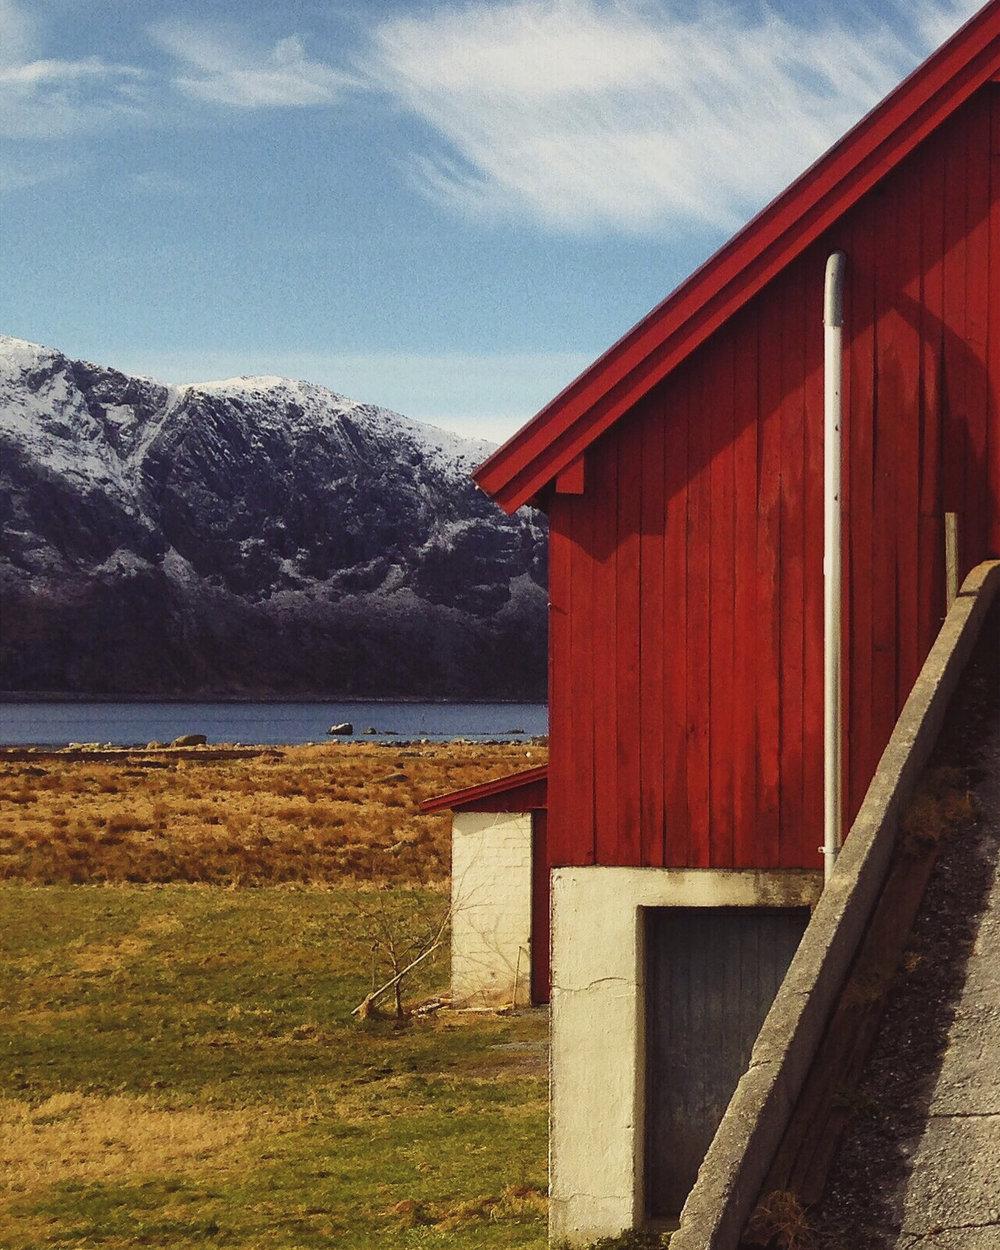 Giske - Norway / Mobilfotografi - Marco Villlabrille